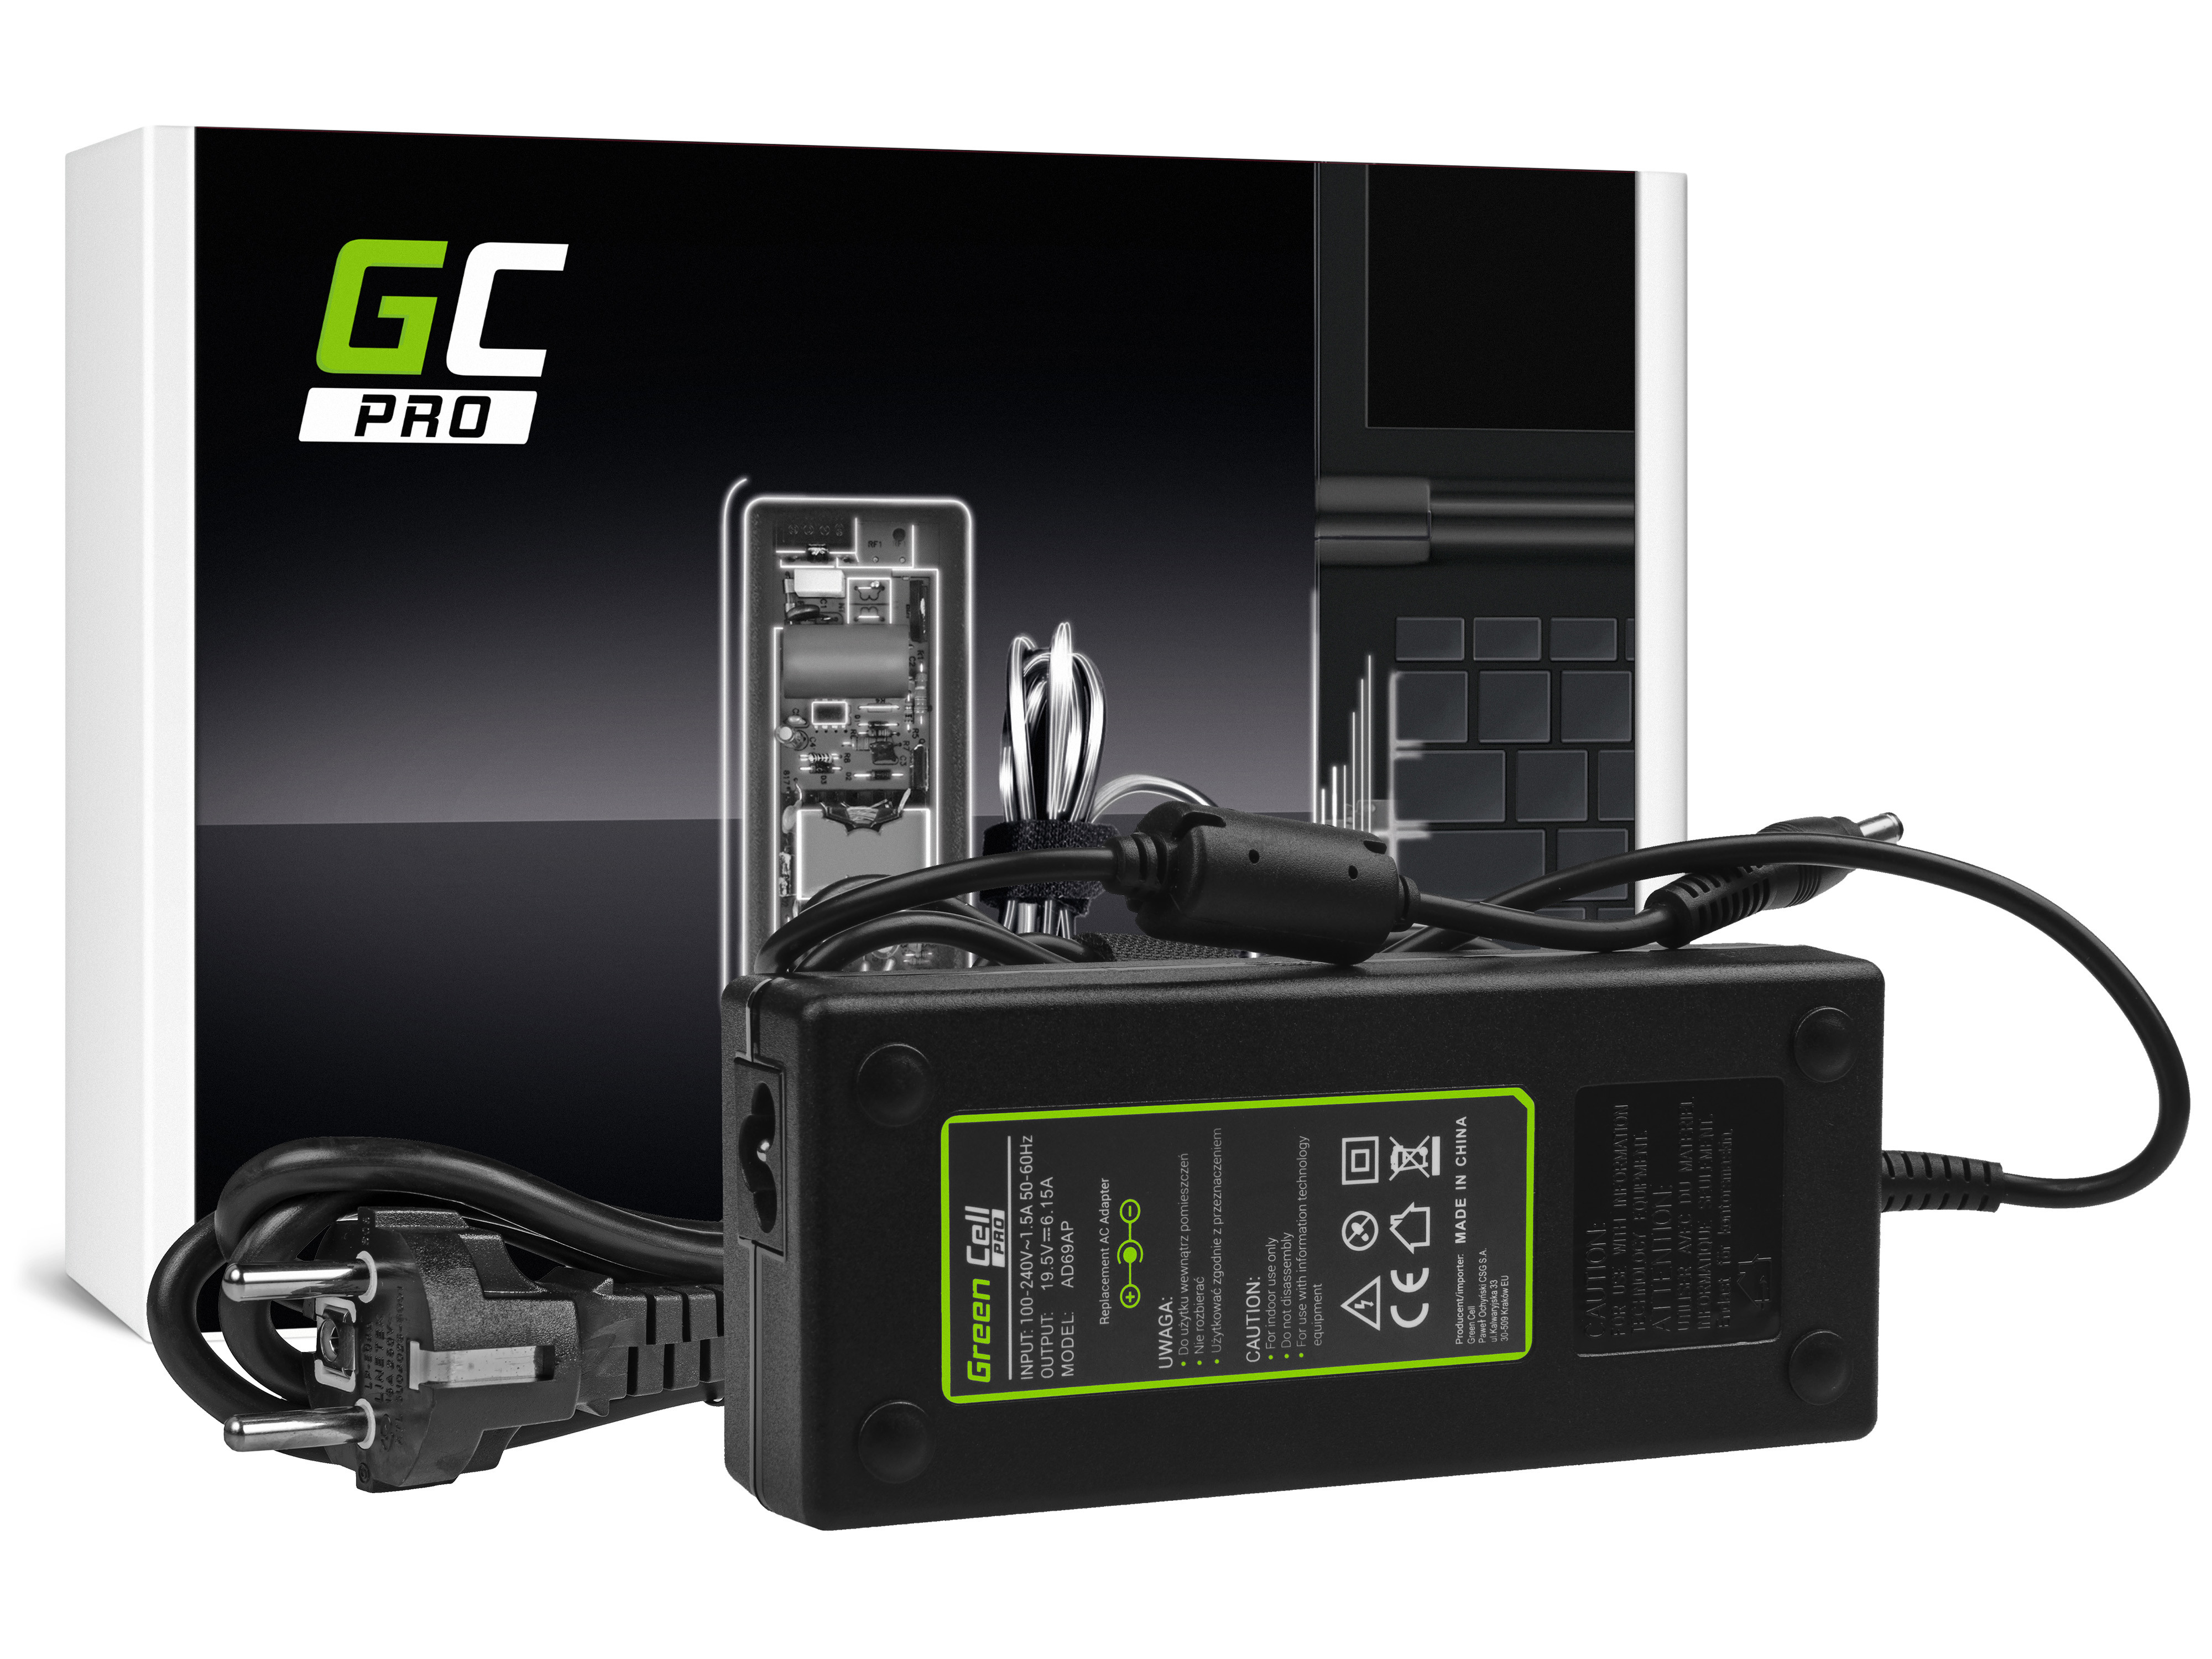 Green Cell AD69AP Nabíječka adaptér pro Lenovo IdeaPad Y510p Y550p Y560 Y570 Y580 Z500 Z570 MSI GE60 GE70 GP70 19.5V 6.15A 120W